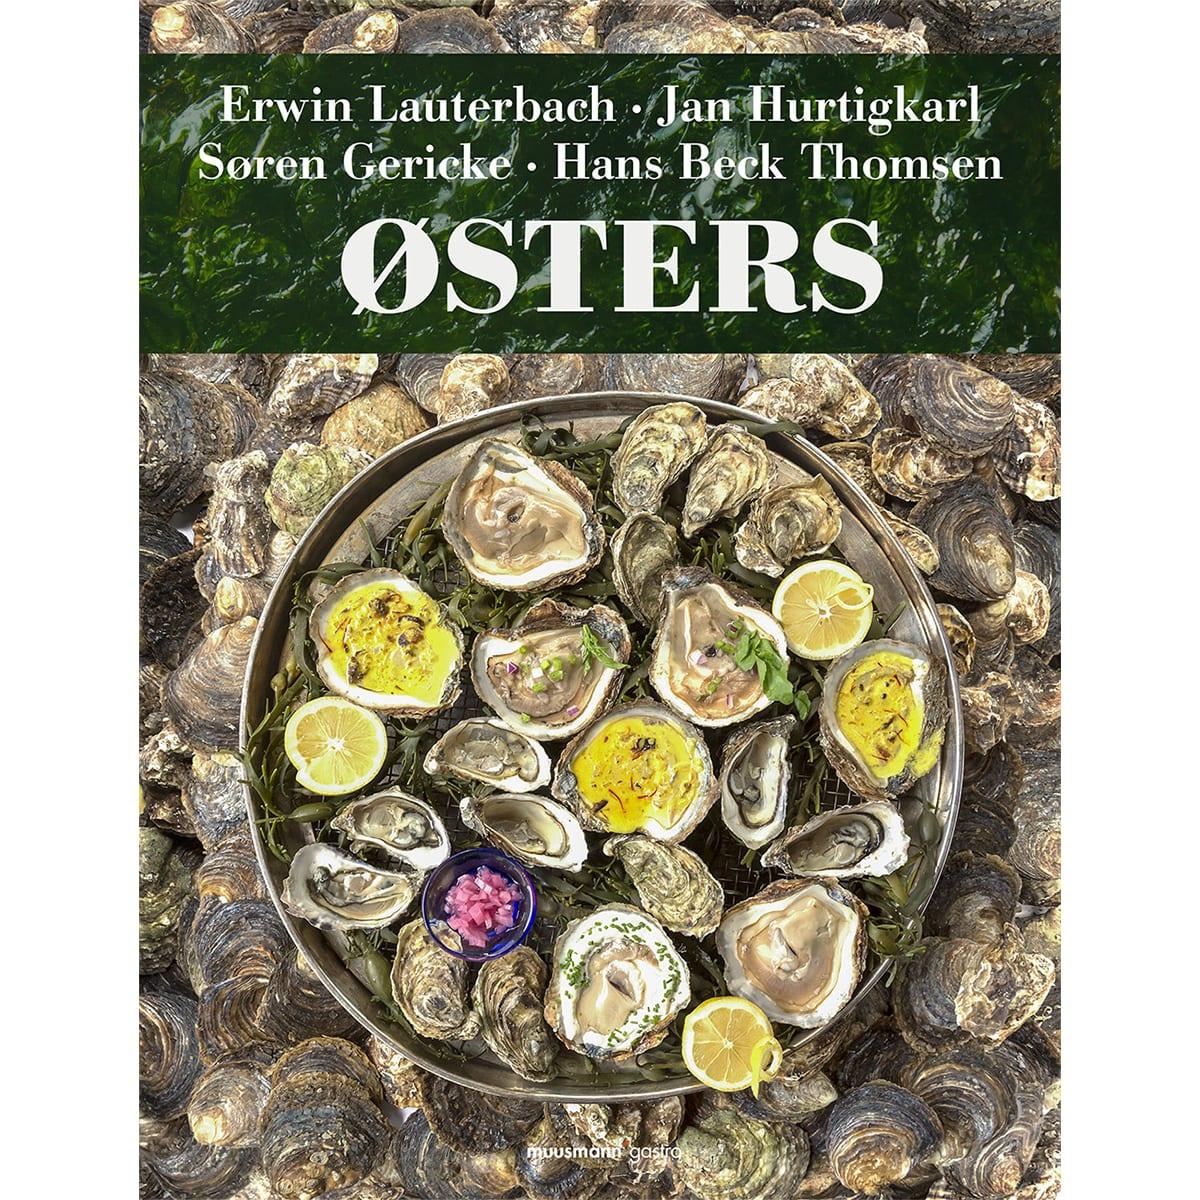 Af Erwin Lauterbach, Jan Hurtigkarl, Søren Gericke & Hans Beck Thomsen